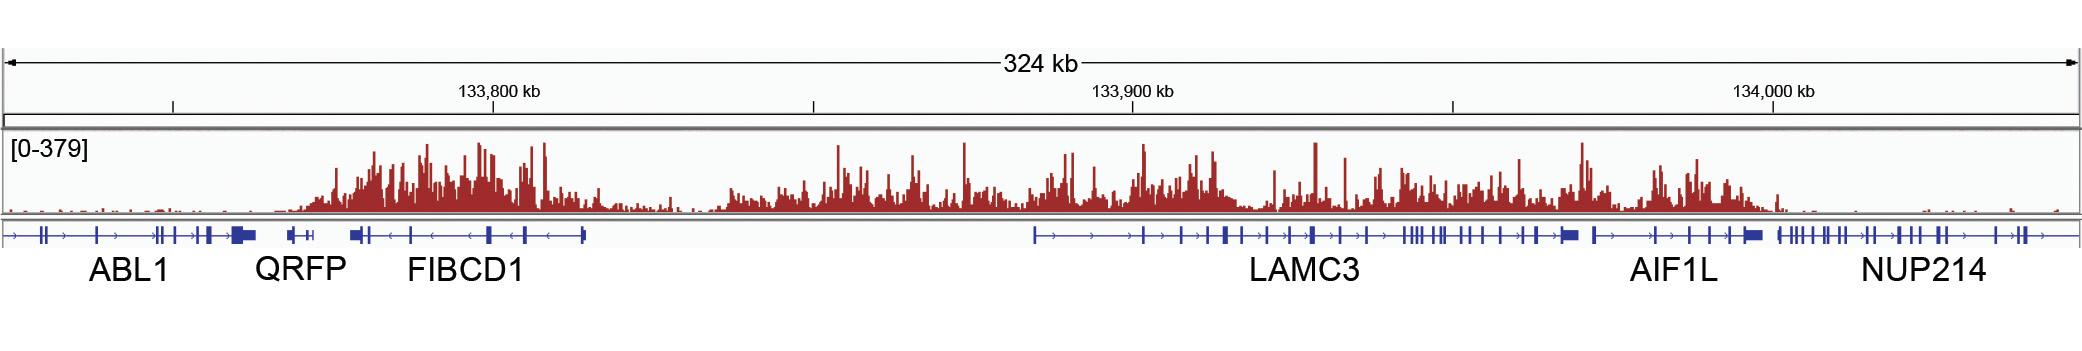 13-0047 CUT&Tag Data